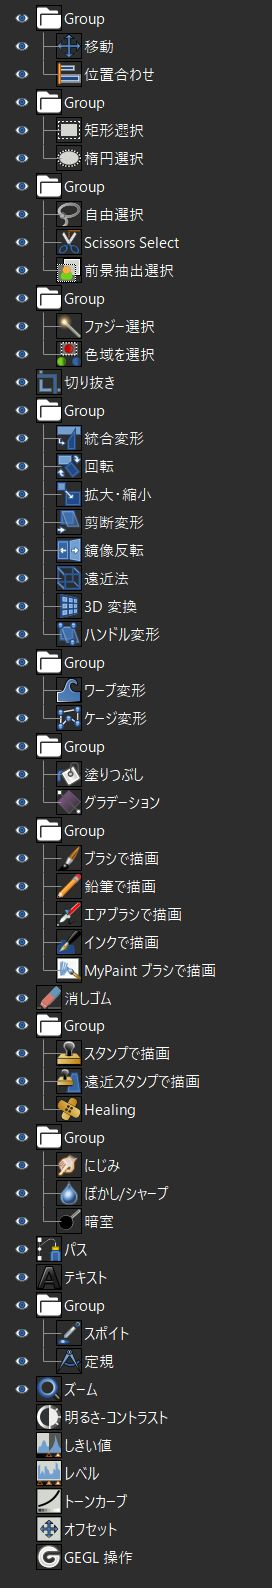 f:id:yasuo_ssi:20210304135634j:plain